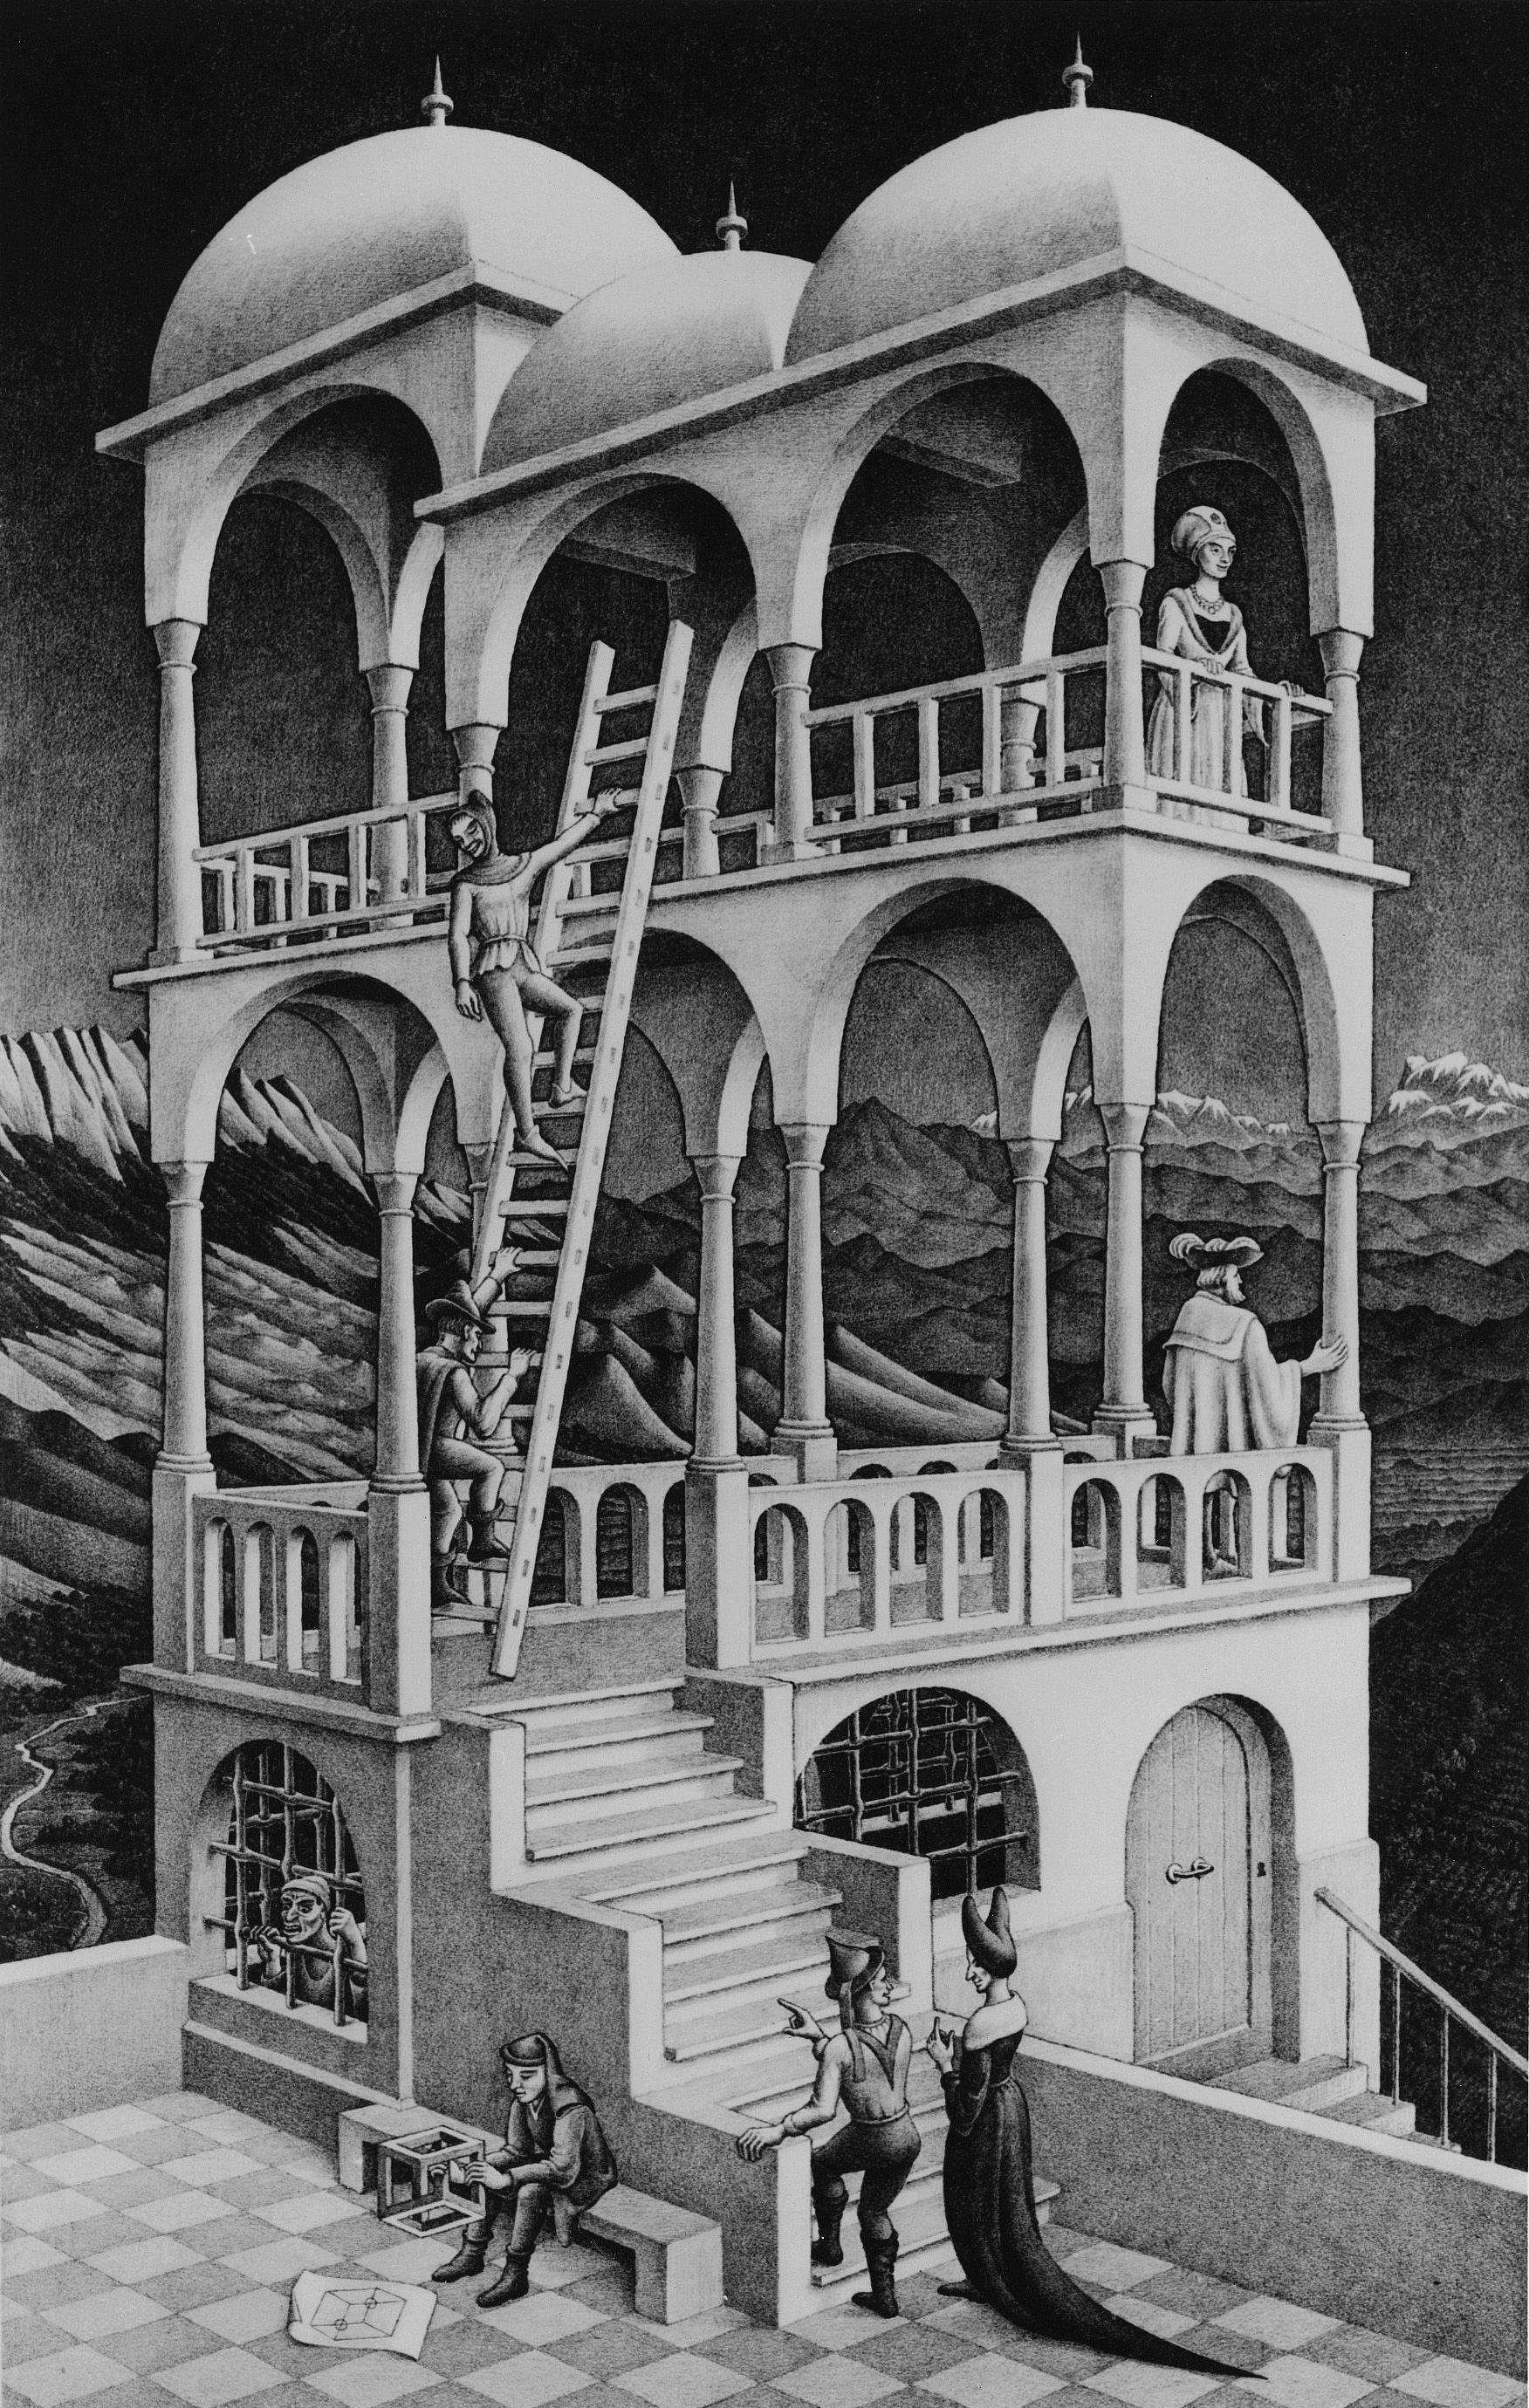 M. C. Escher, Belvedere,1958.